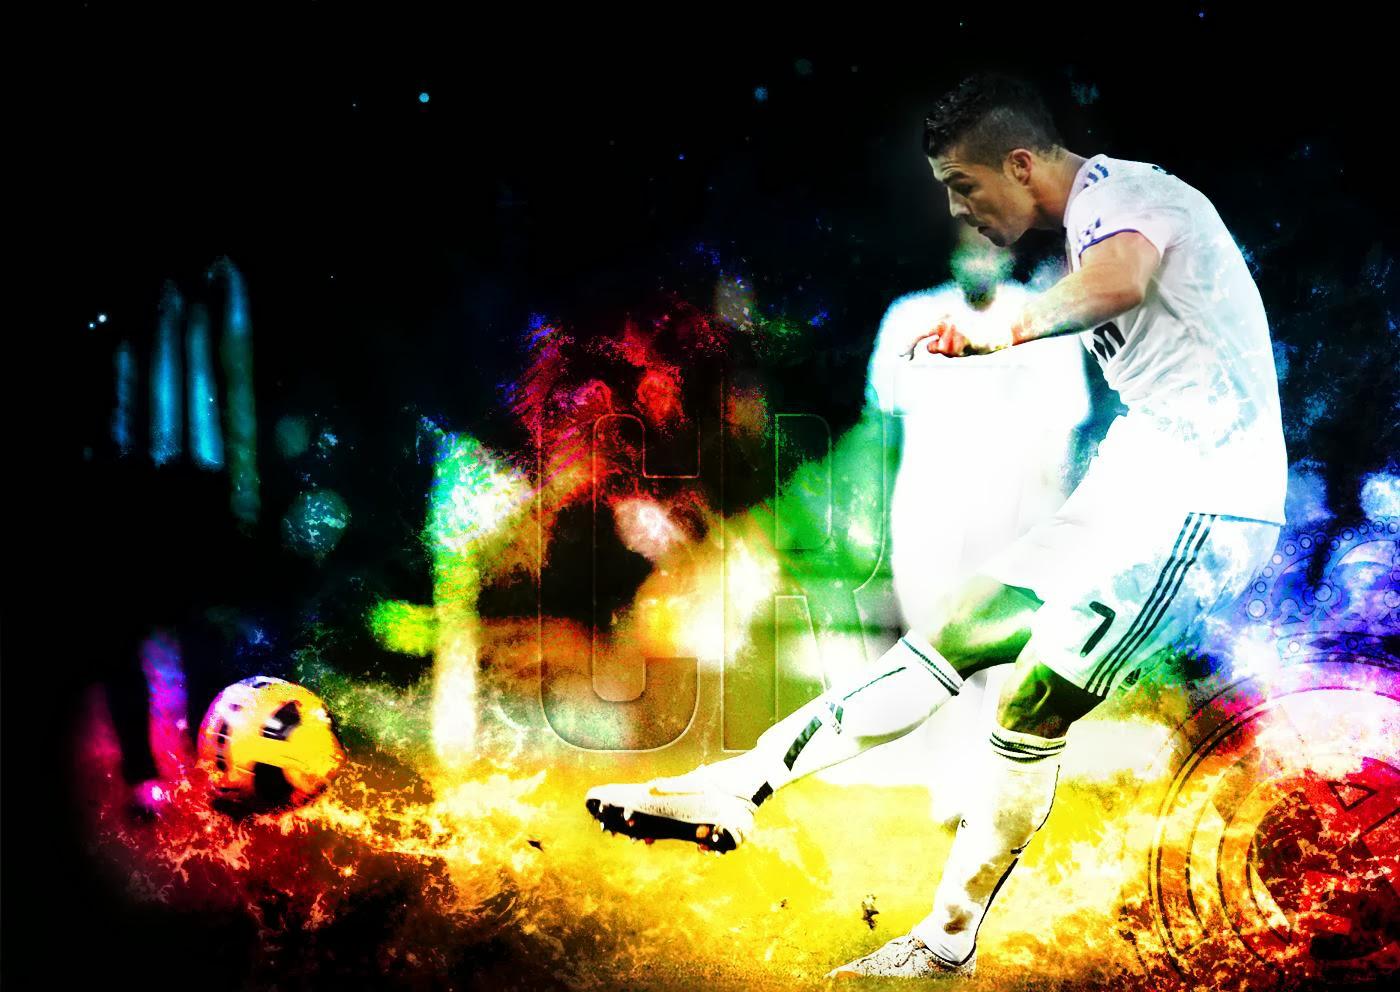 Cristiano Ronaldo Free Kick 2014